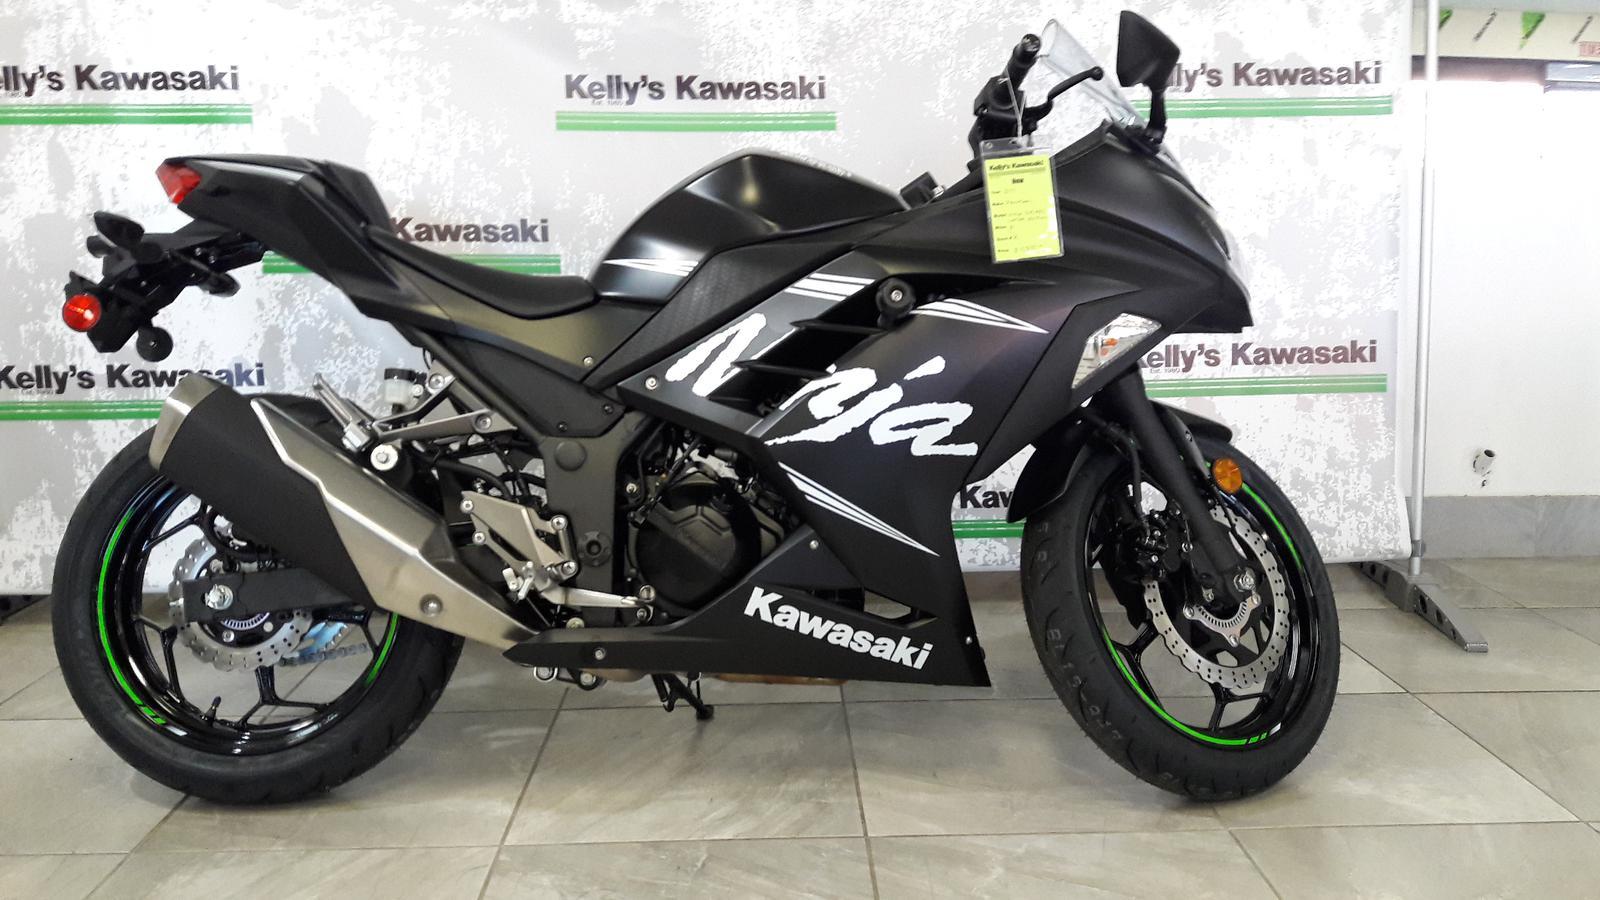 2017 Kawasaki Ninja® 300 ABS Winter Test Edition for sale in Mesa